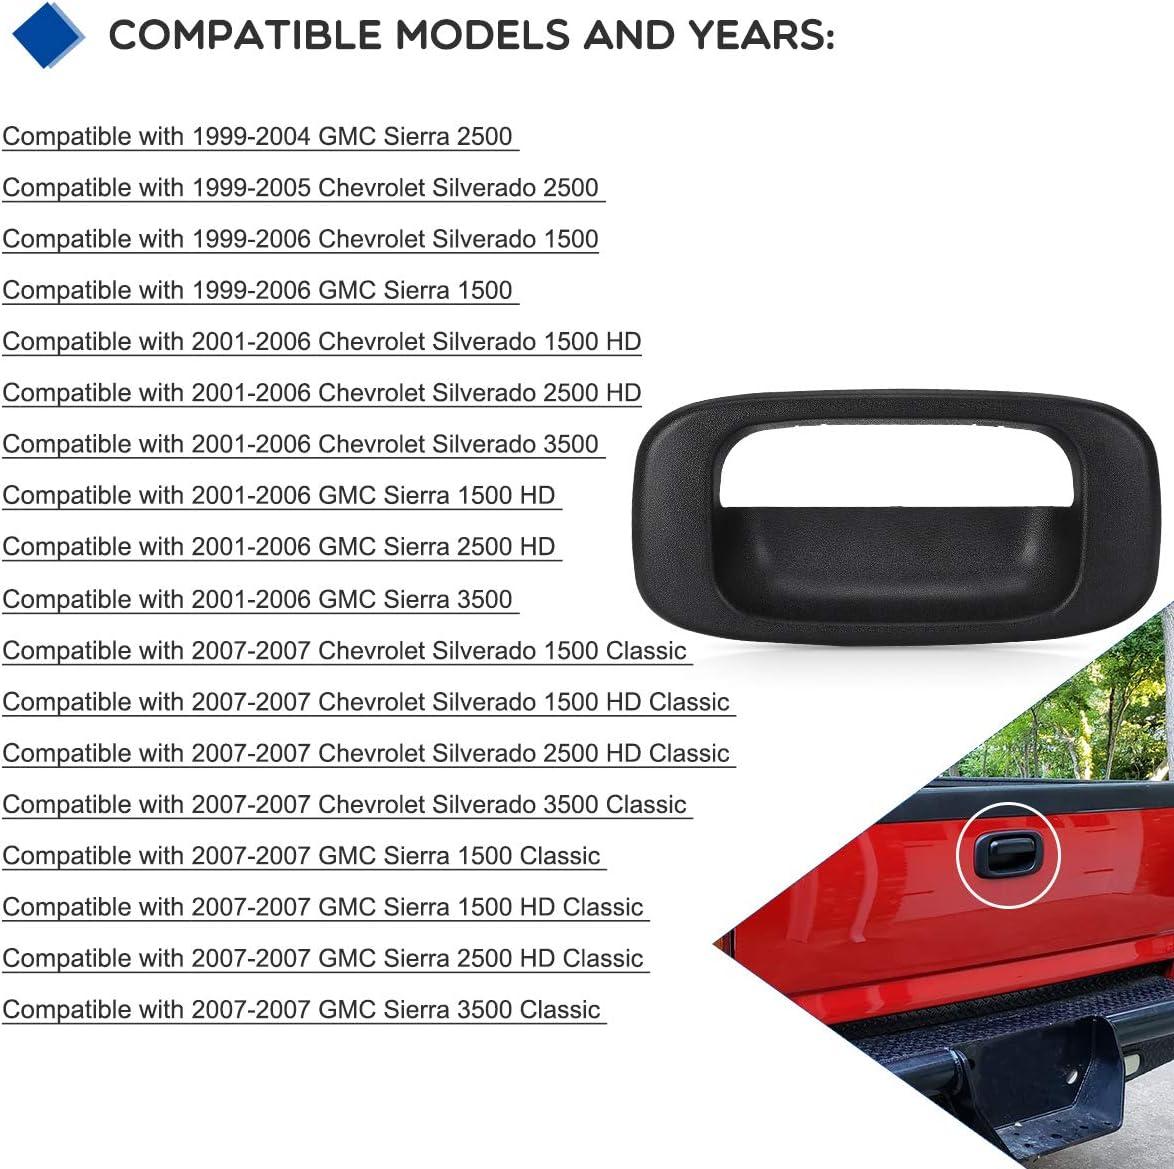 YITAMOTOR Textured Black Tailgate Bezel Trim Compatible with 99-07 Chevy Silverado GMC Sierra 1500 2500 3500 HD Classic Tailgate Bezel Compatible for Chevy Silverado